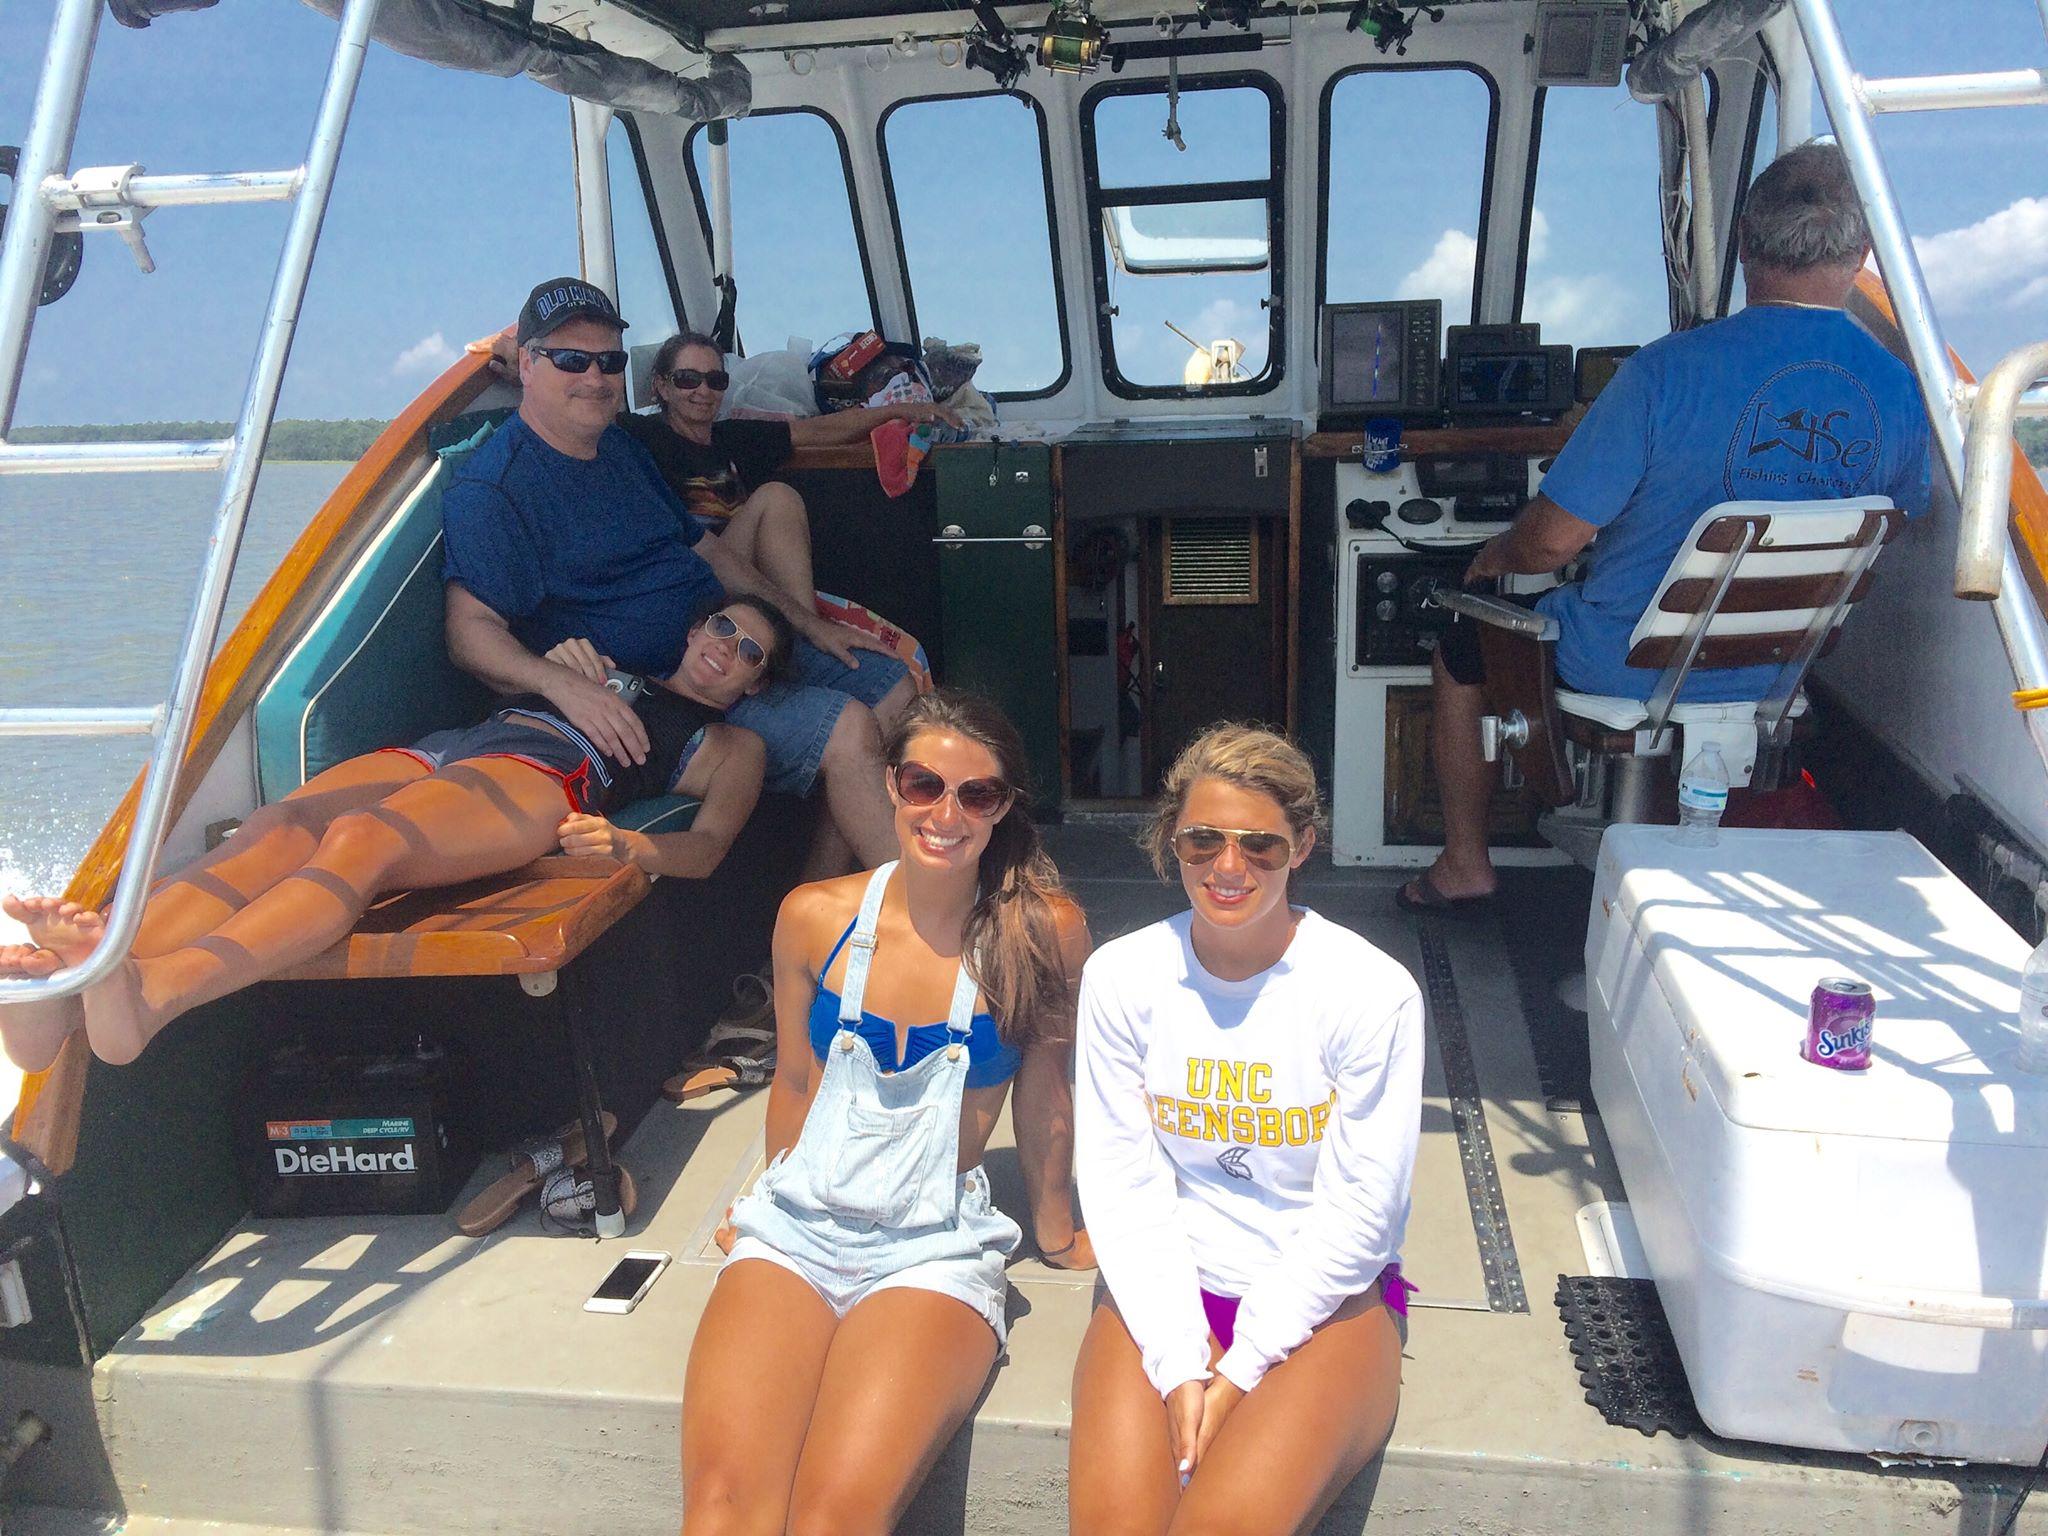 Girls hangout on boat deck